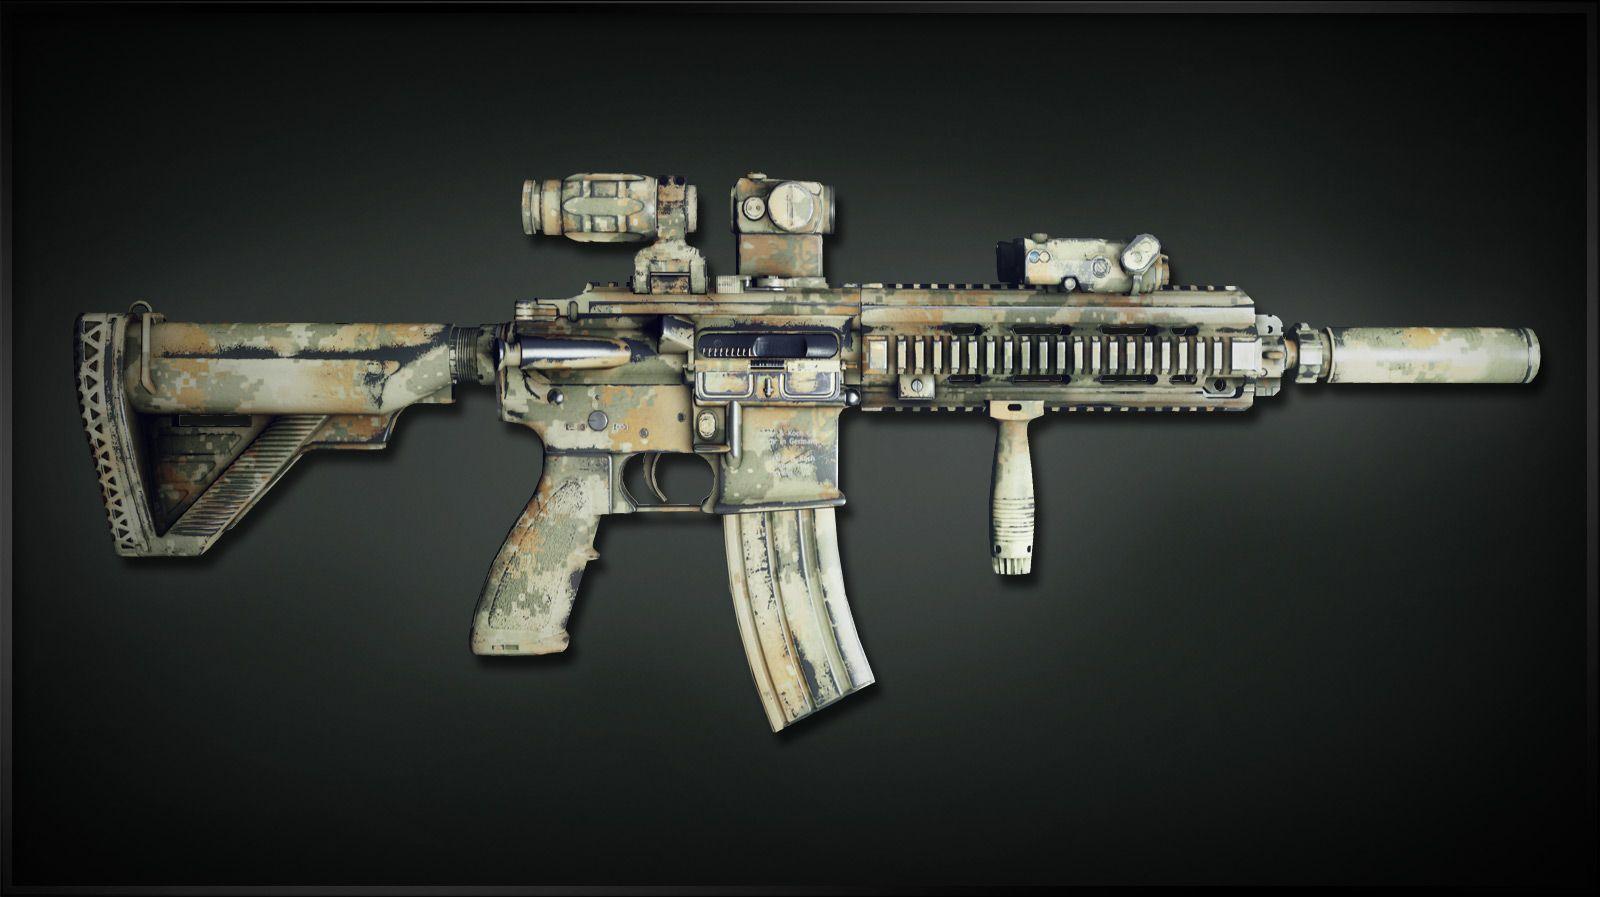 HK416 from MoH: Warfighter | Second Amendment Accessories | Pinterest